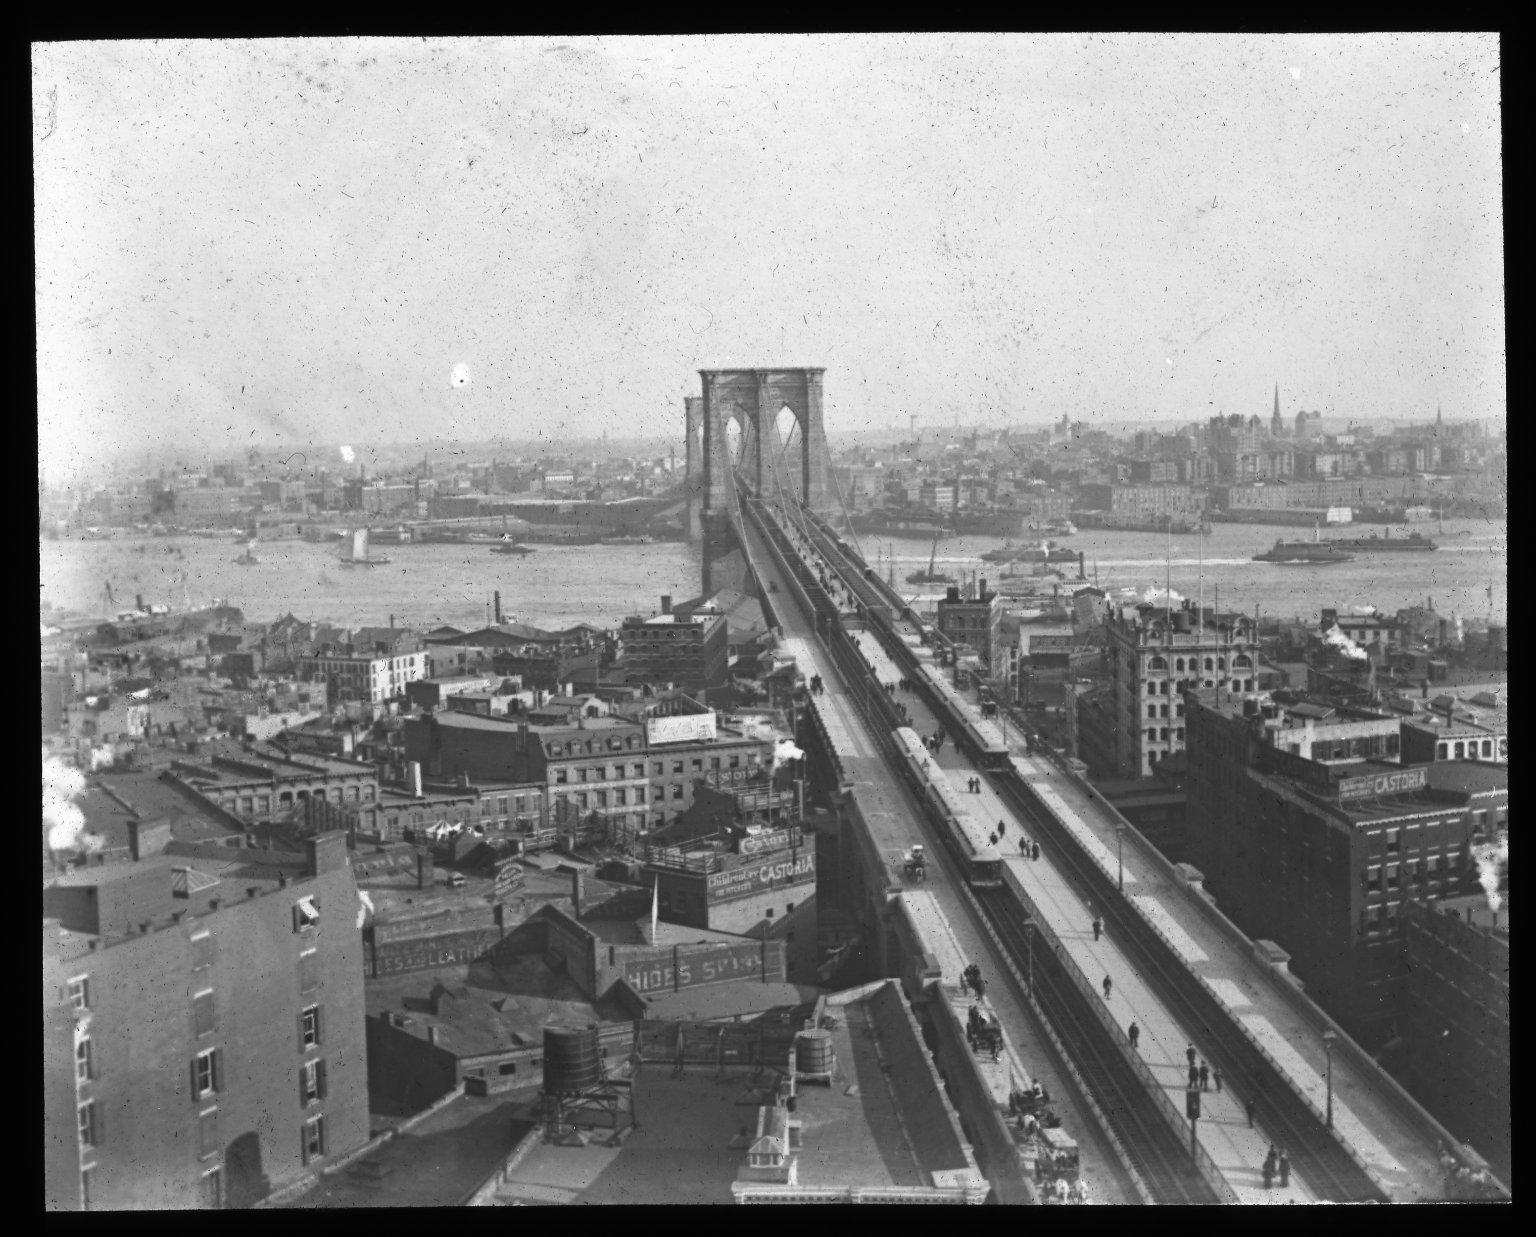 Bridge and Brooklyn; form New York. Collection- Lantern Slide Collection Views- U.S., Brooklyn Brooklyn Bridge 1896-1900